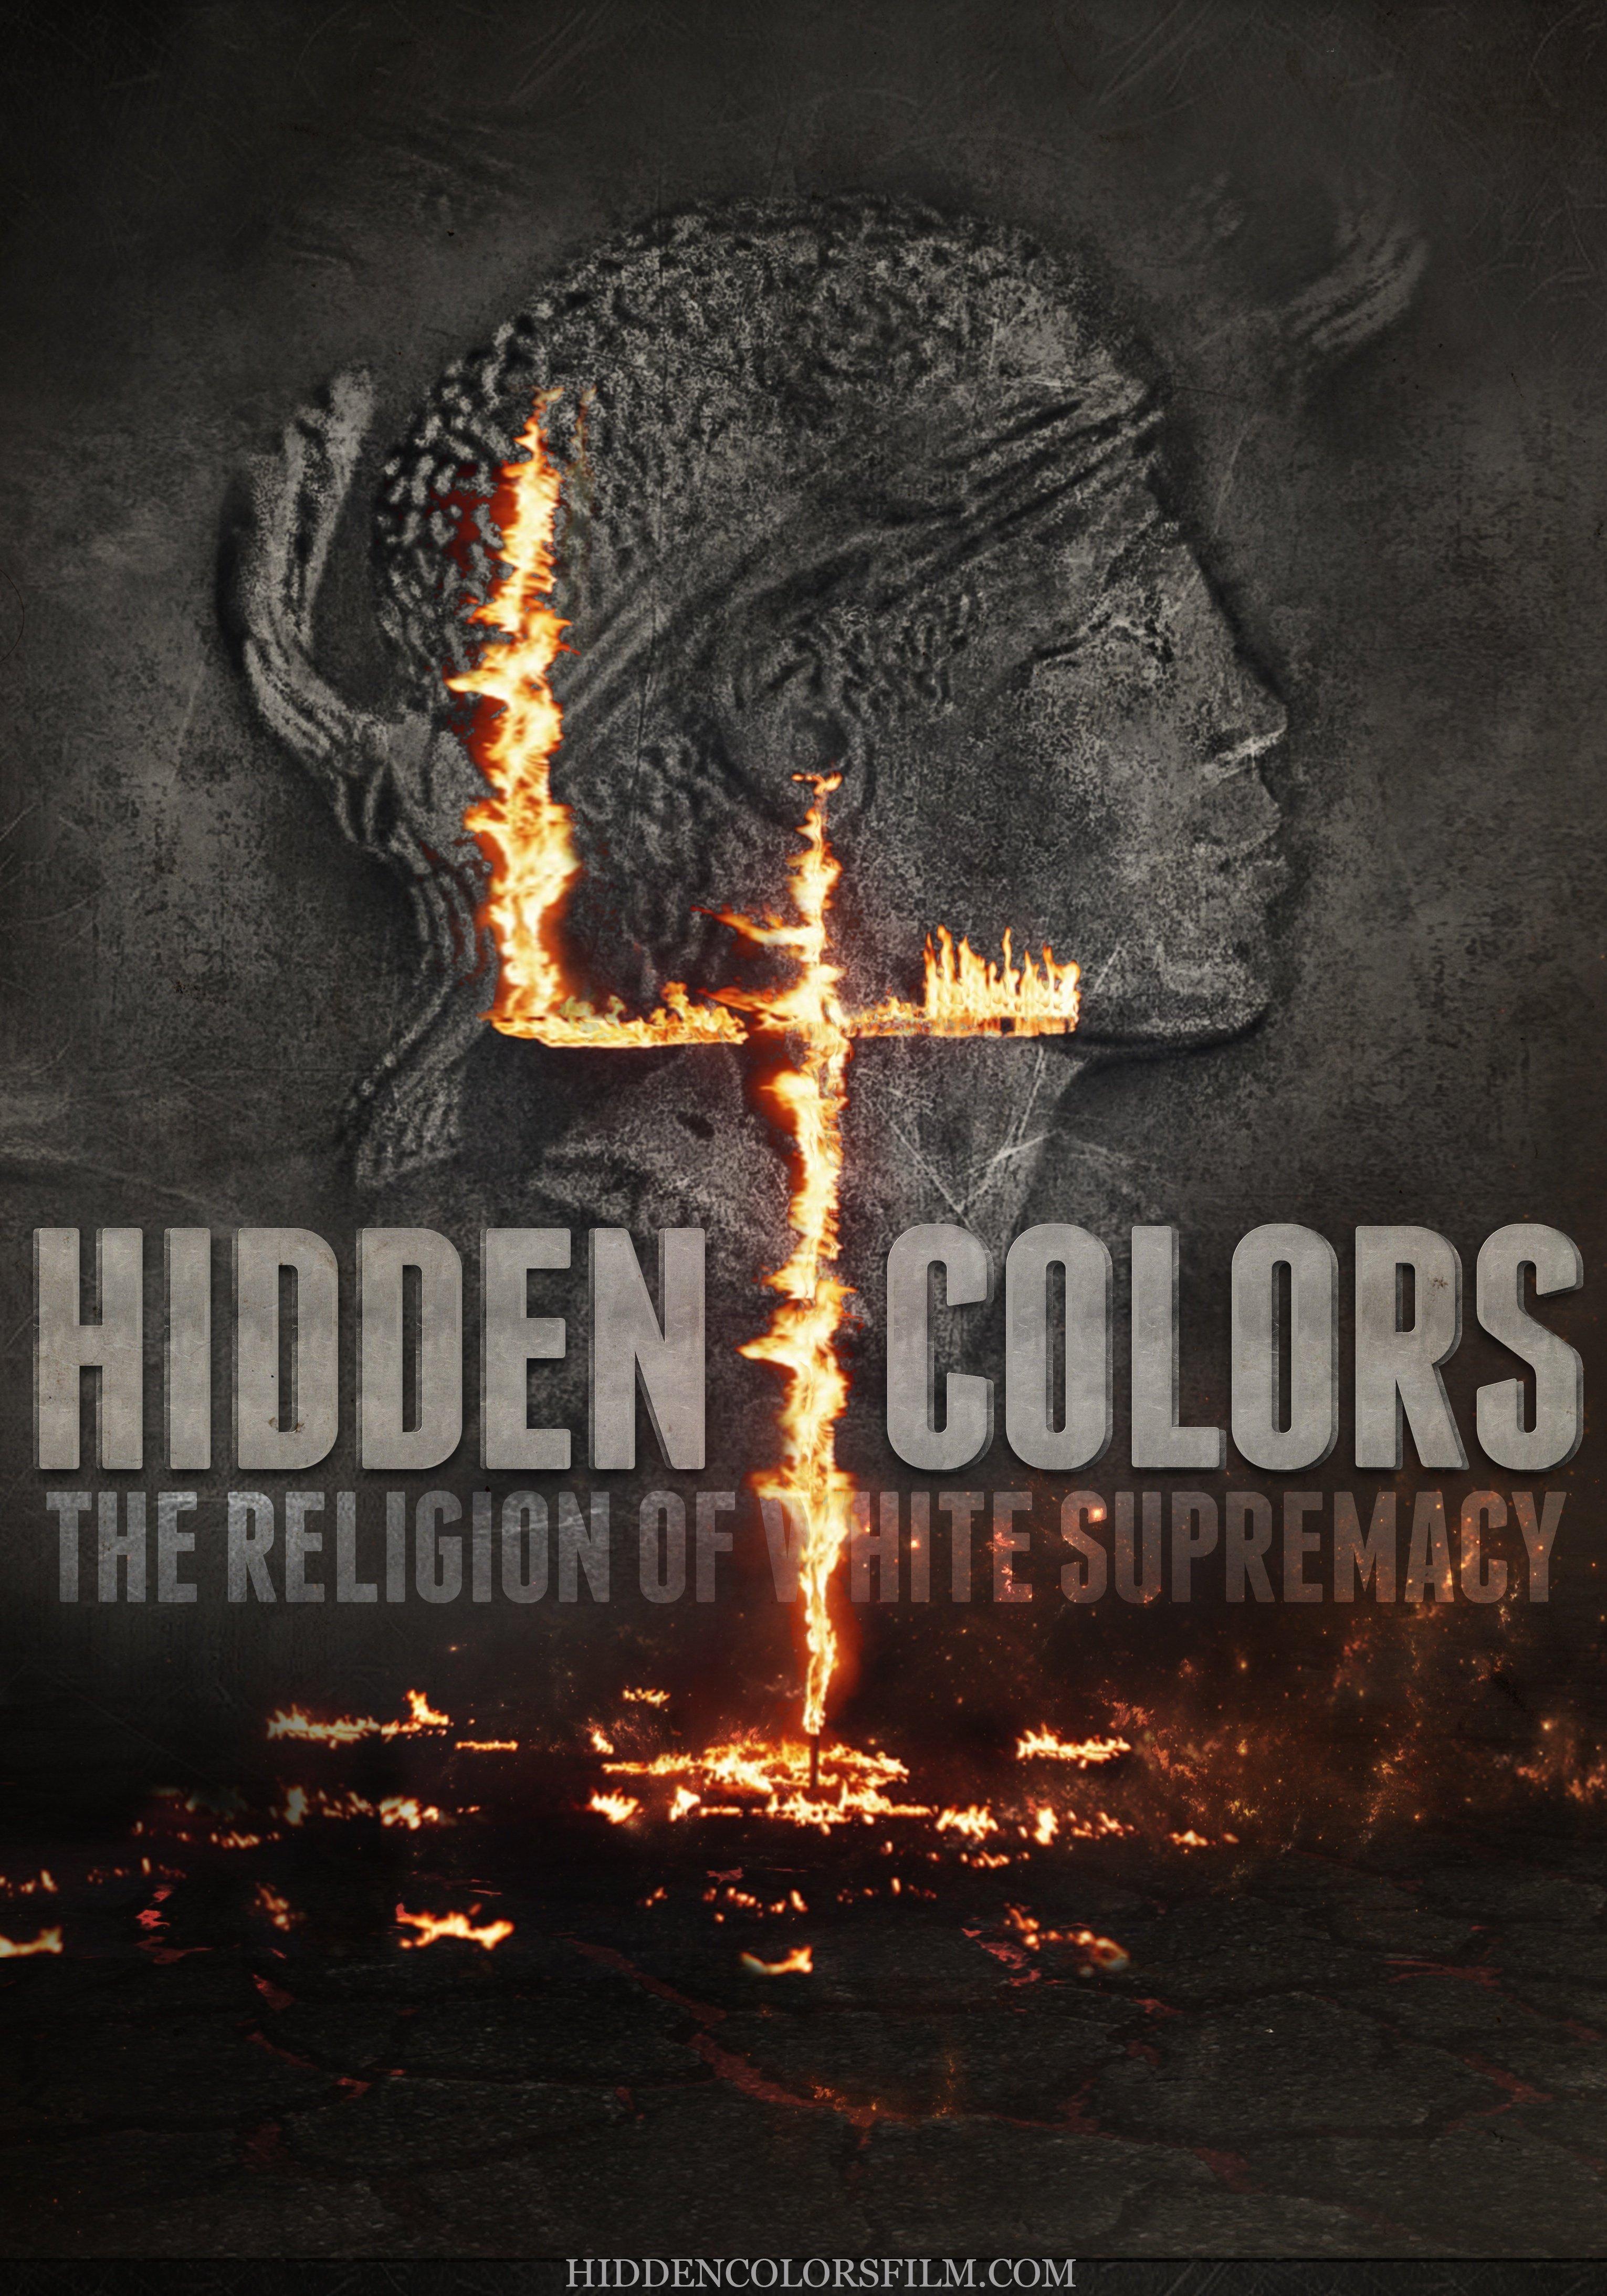 hidden colors 4 the religion of white supremacy 2016 imdb